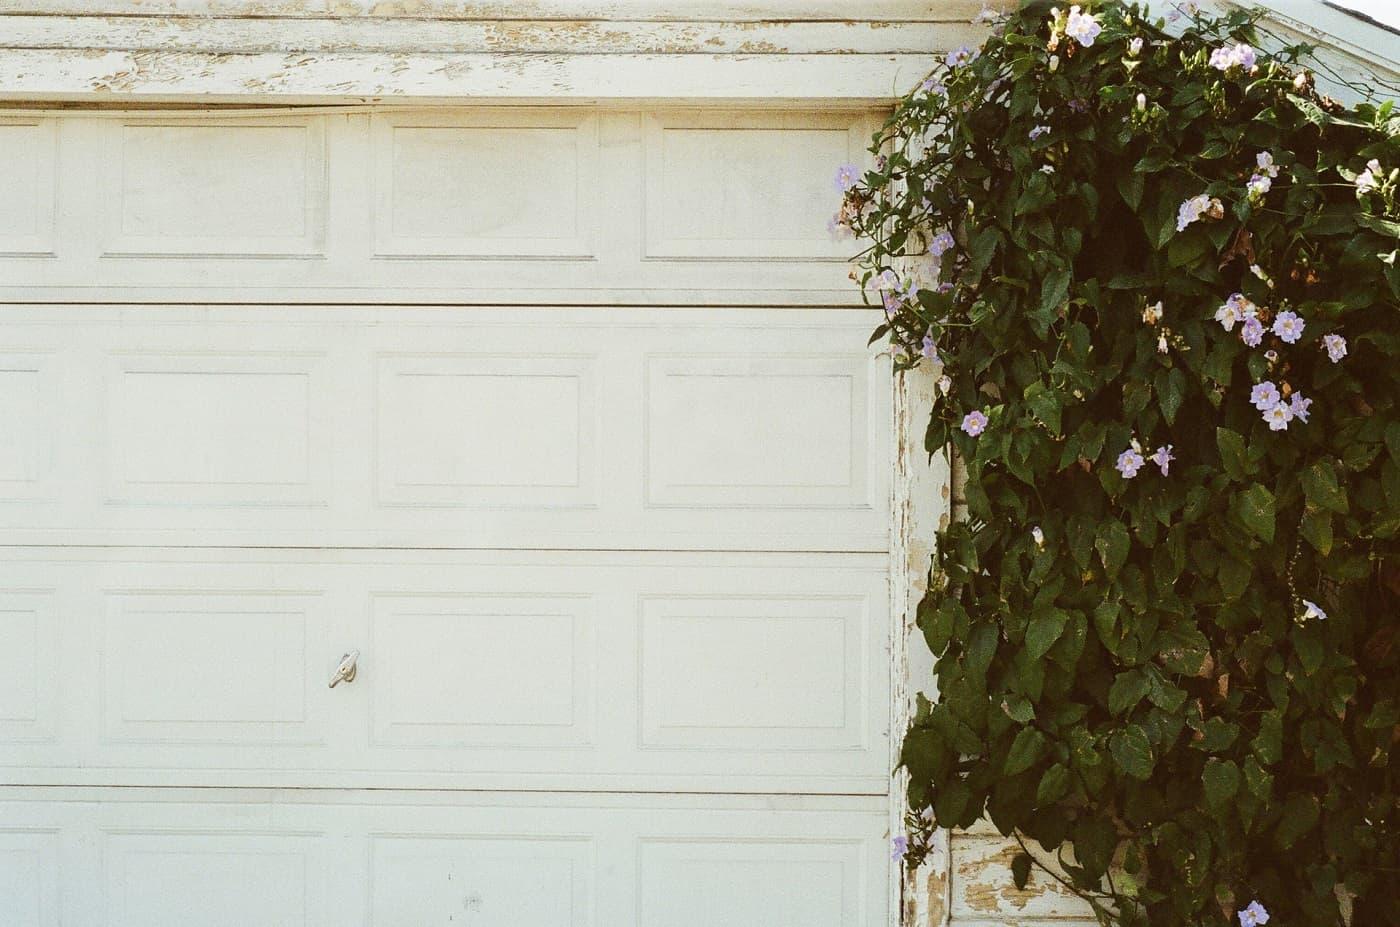 Garage door with plant beside it. Photo from Jaymantri via Pexels.